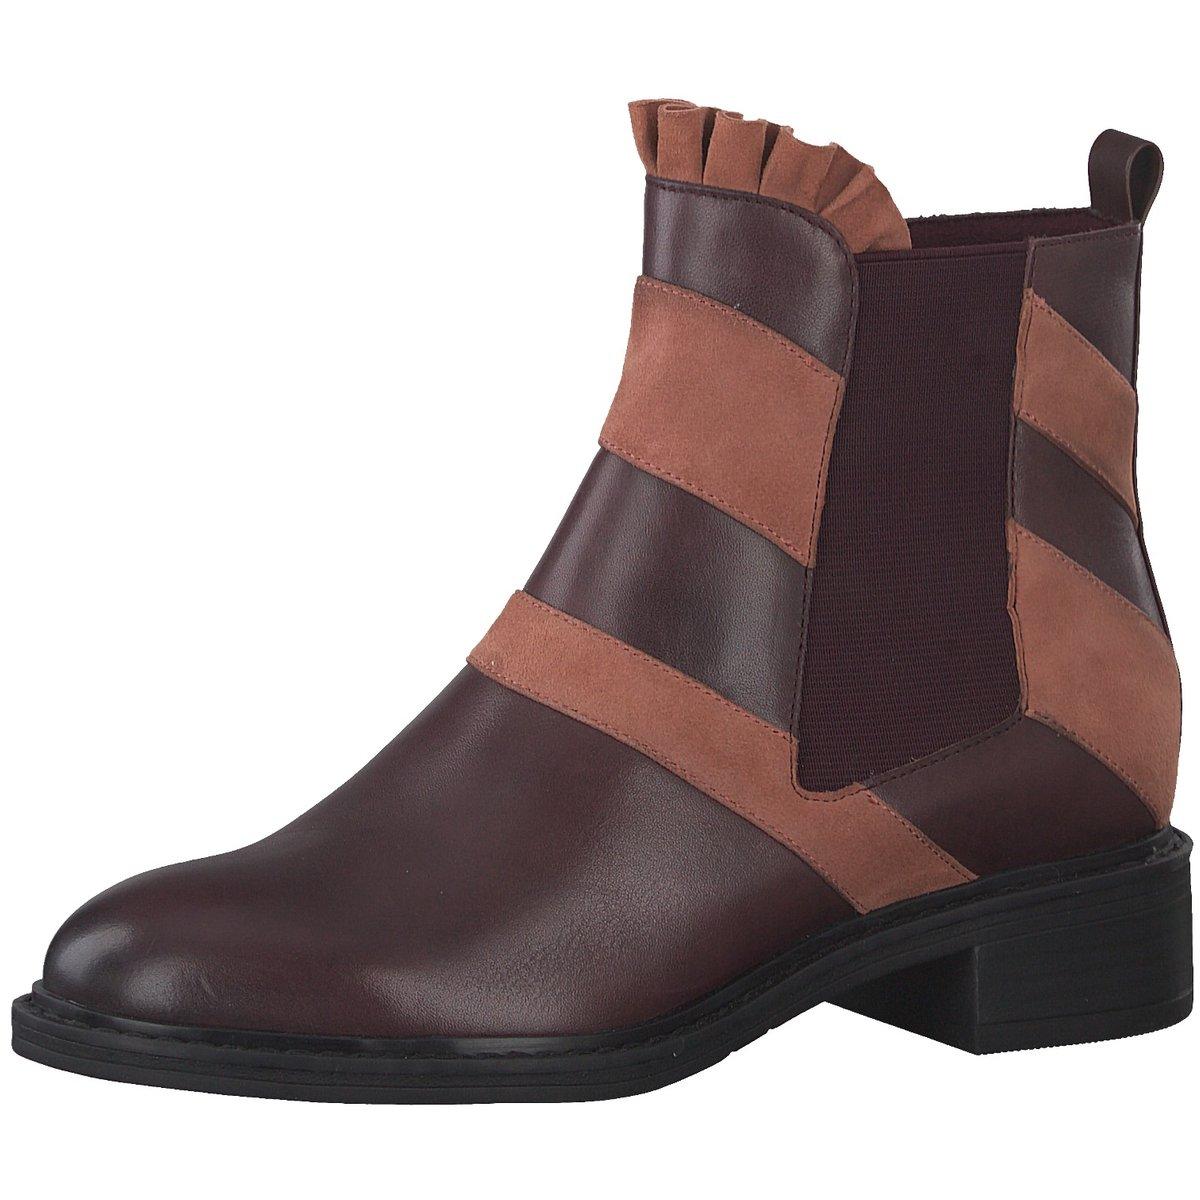 Tamaris Damen Stiefeletten Schuhe 25316 Boots Vine (weinrot